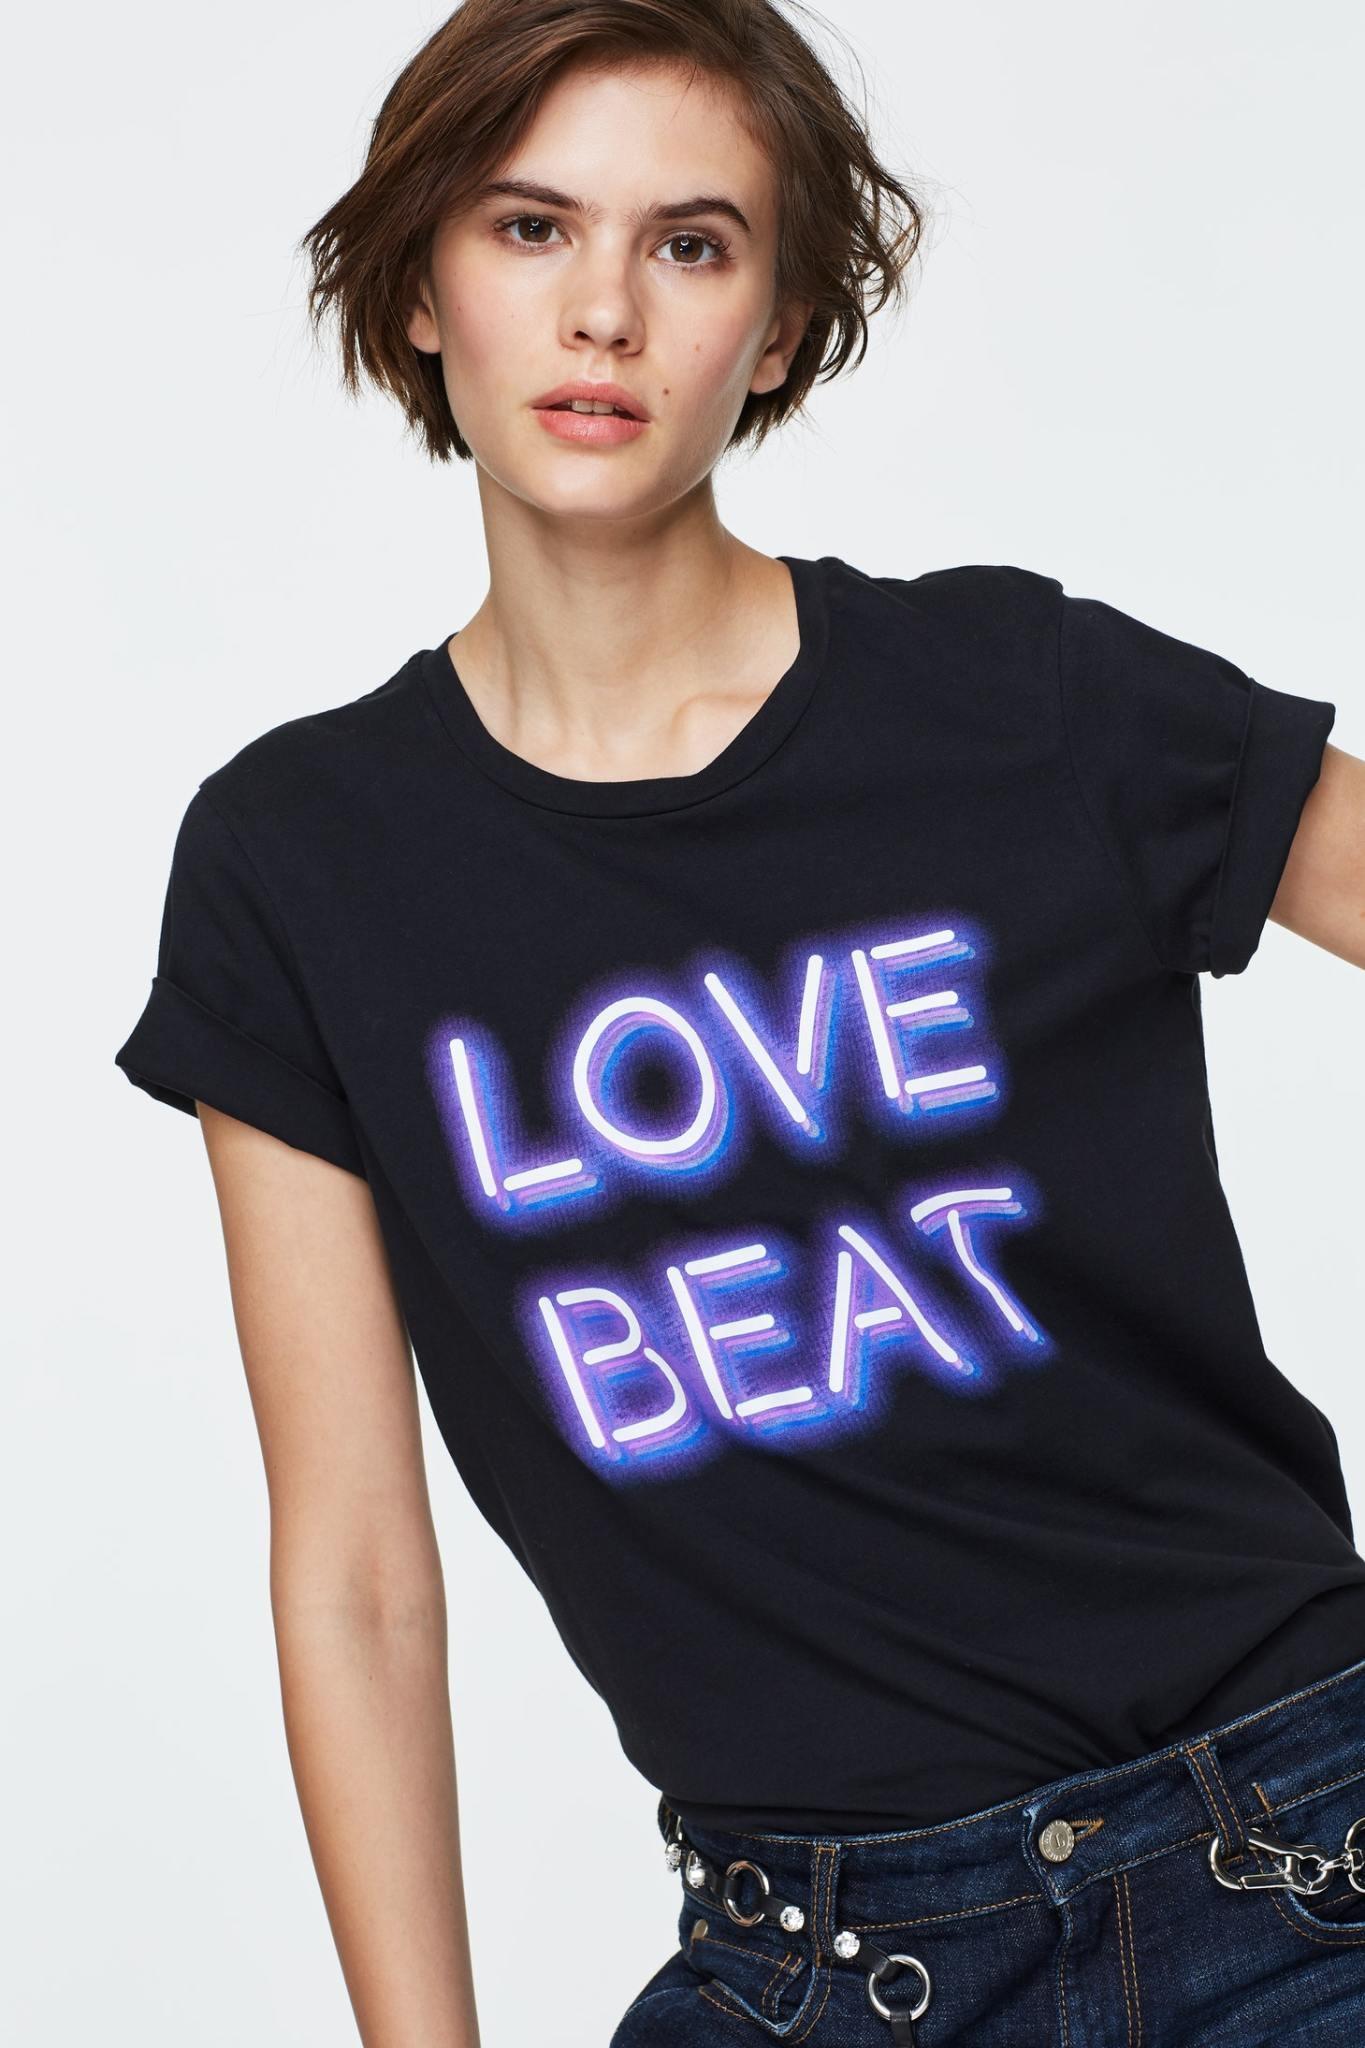 Neon love beat shirt dorothee schumacher-2